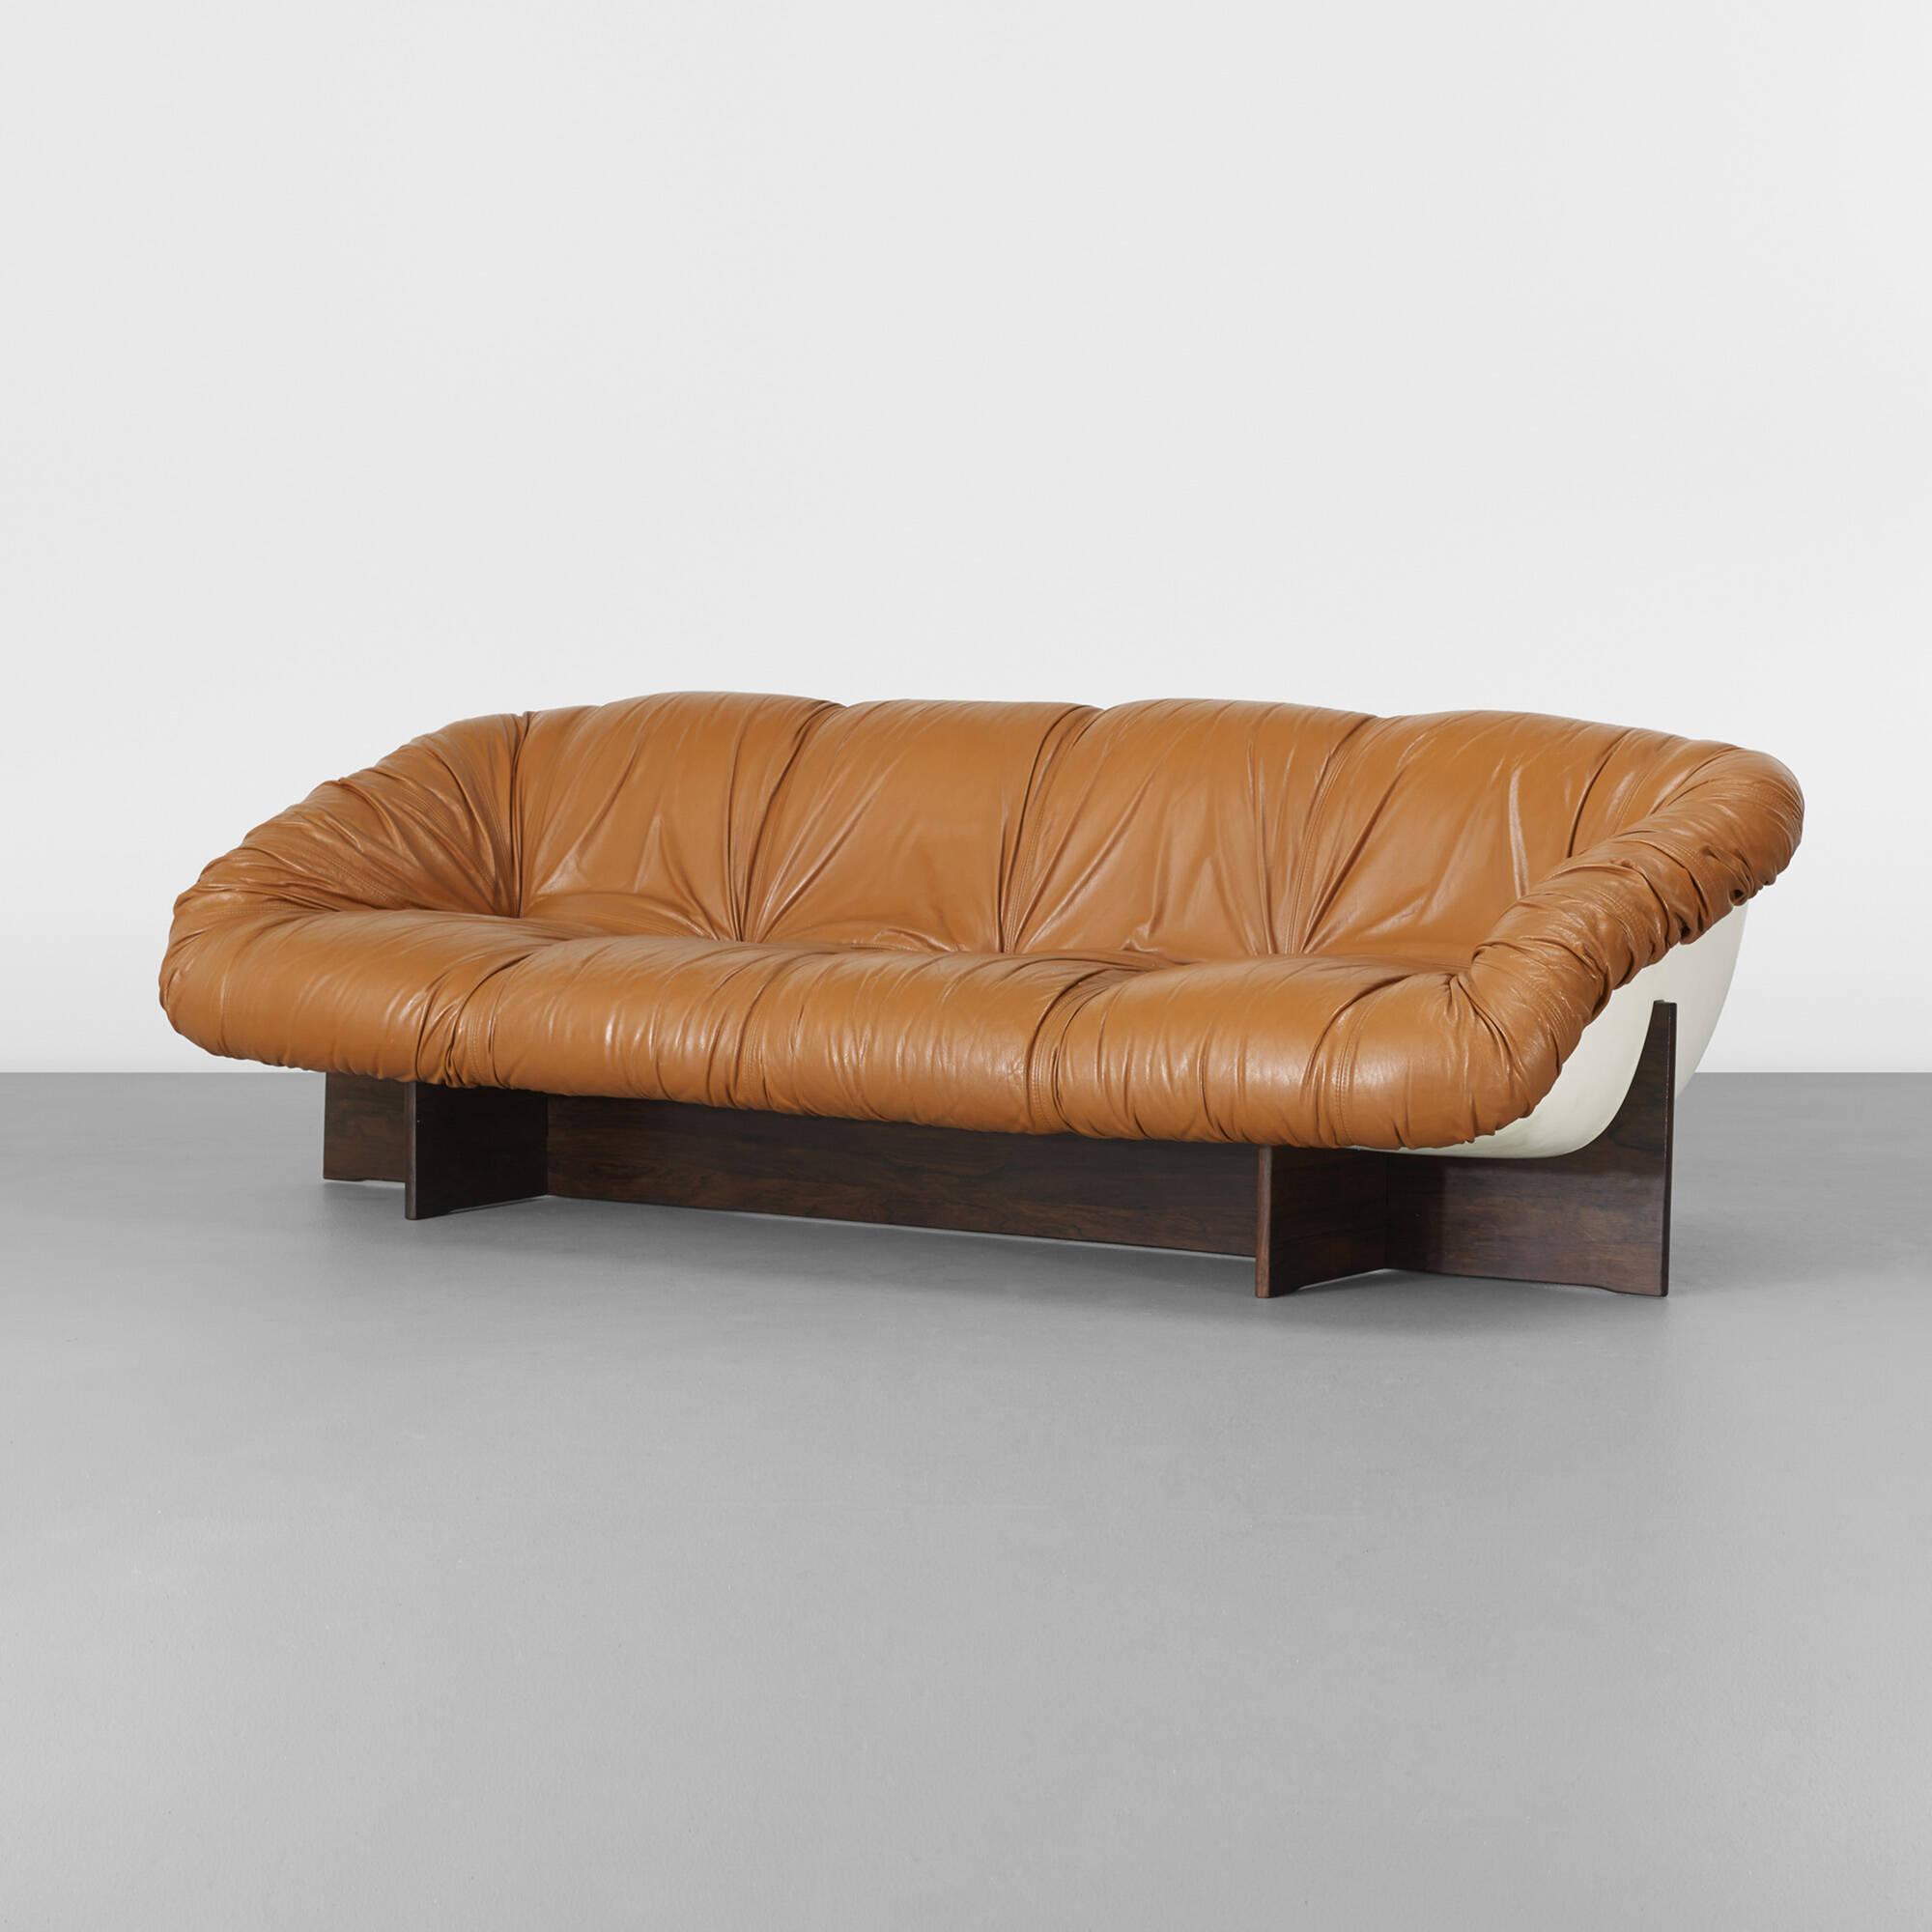 319 Percival Lafer Sofa 1 Of 3